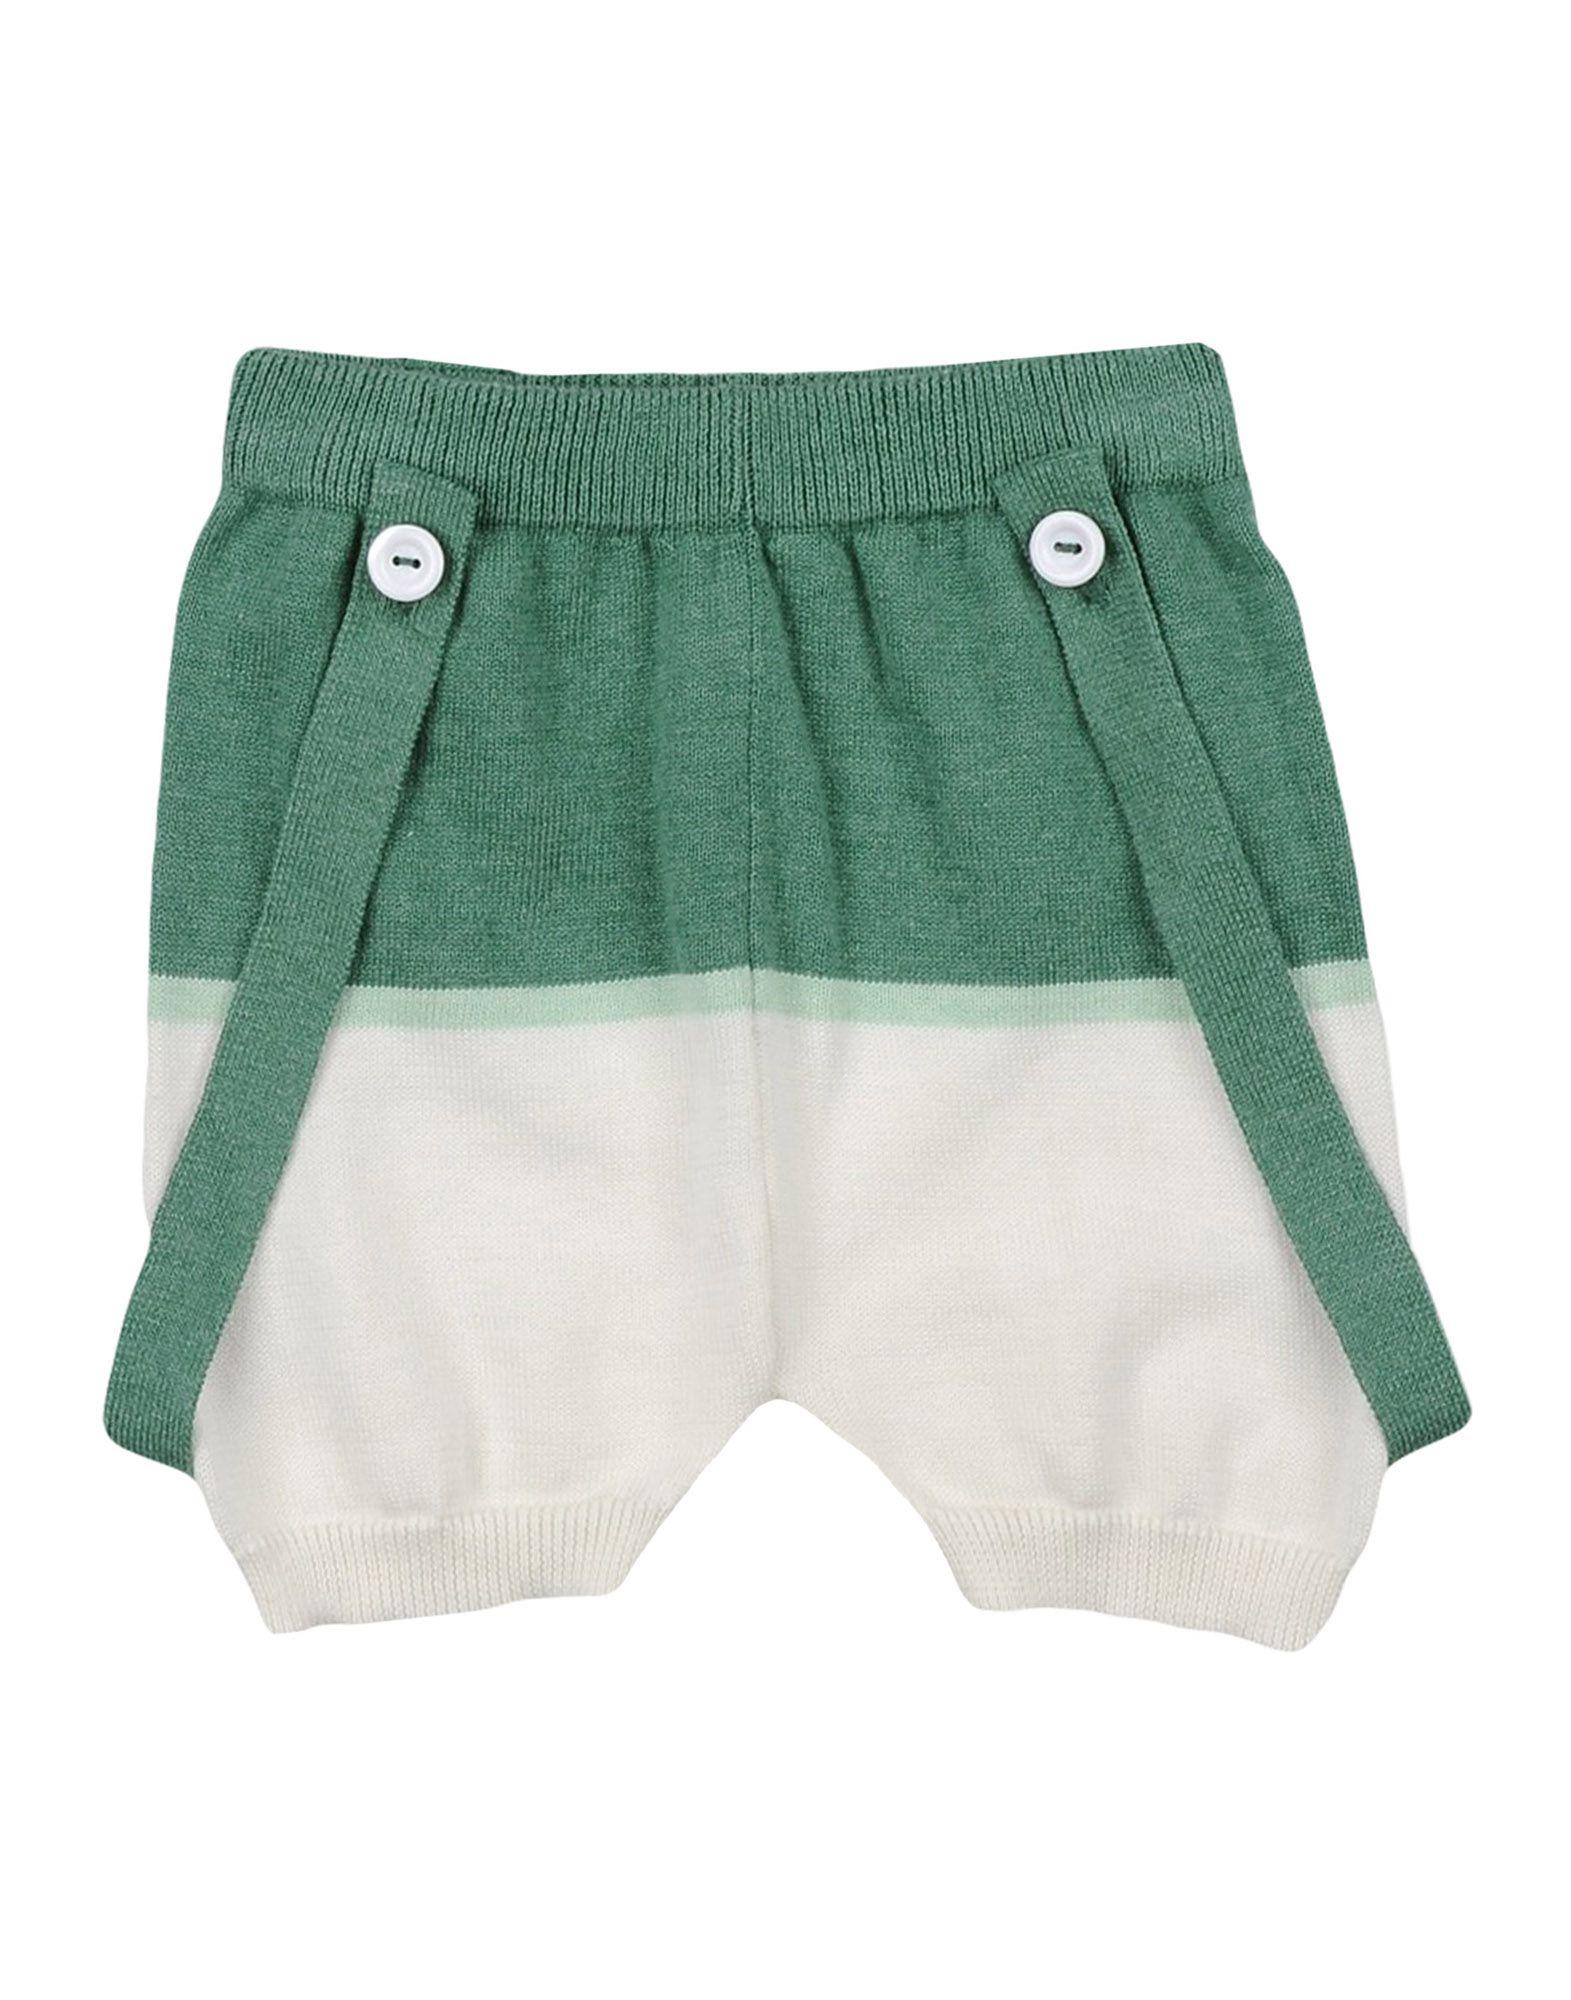 LUPUS IN FABULA Baby overalls